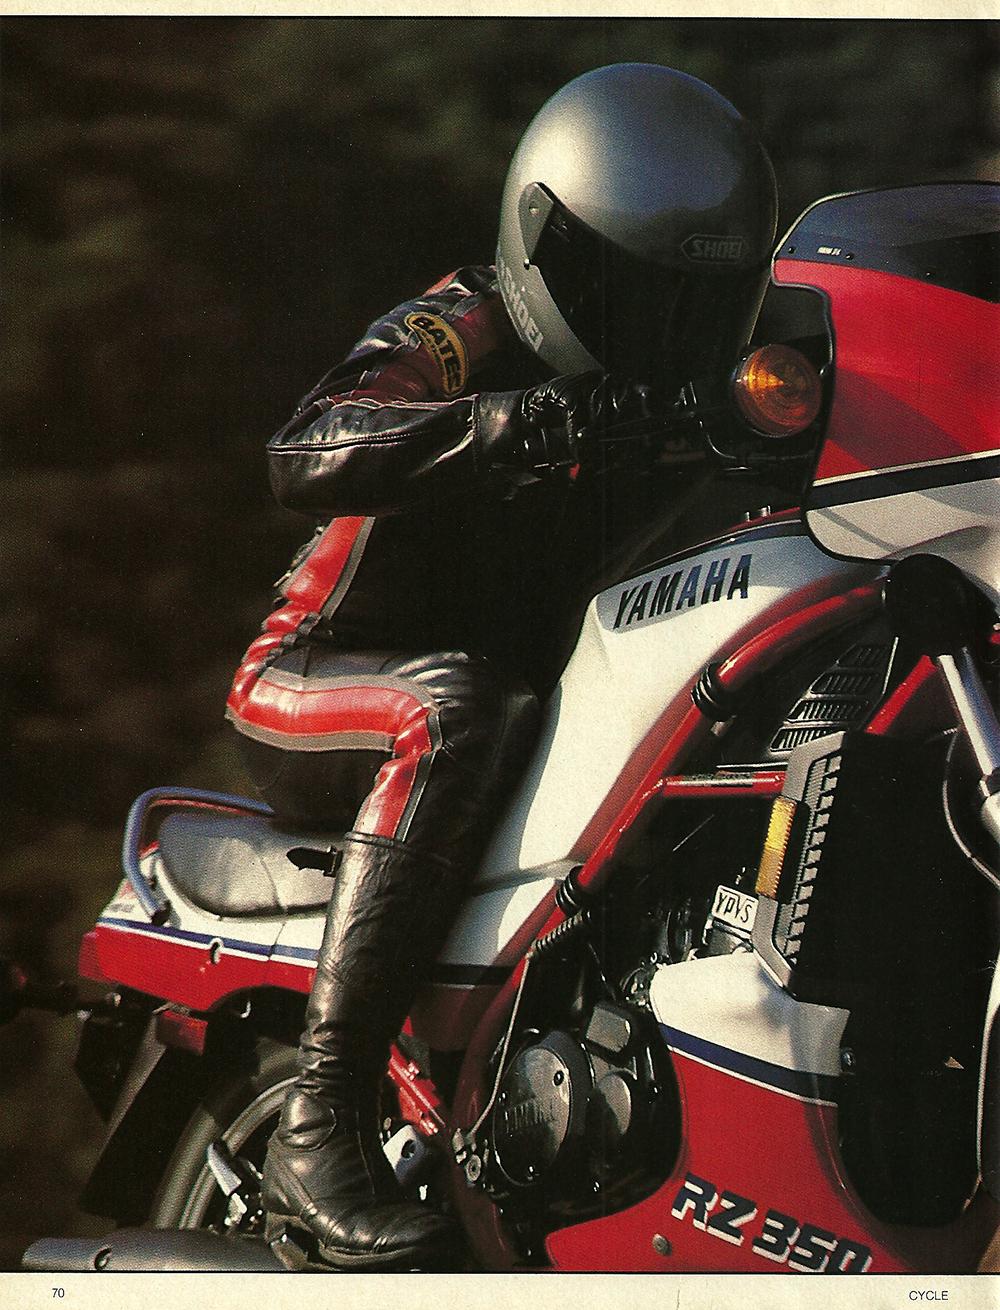 1984 Yamaha RZ350L road test 01.jpg